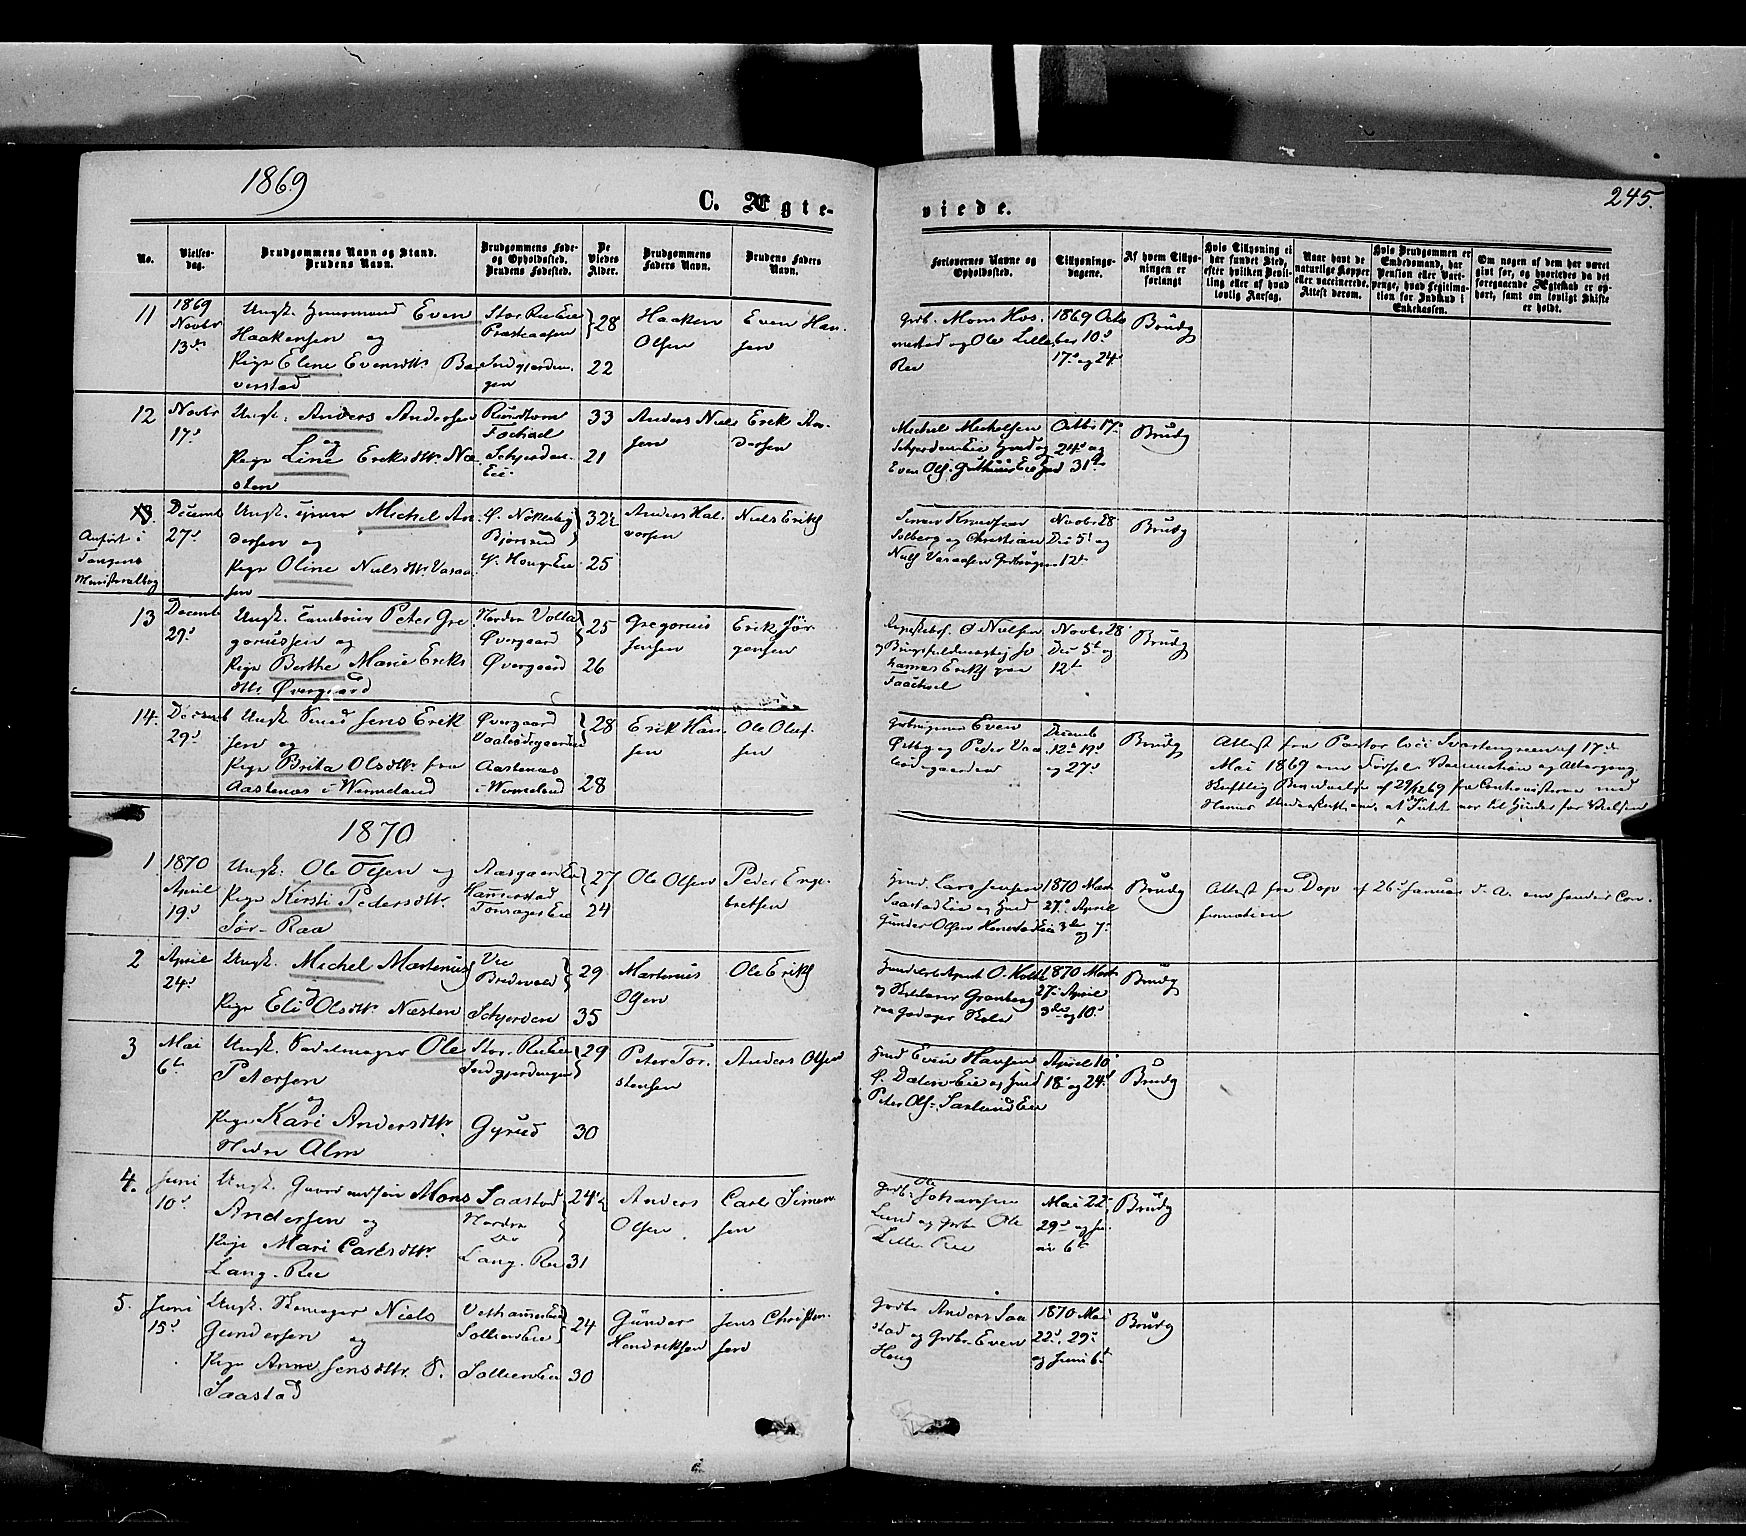 SAH, Stange prestekontor, K/L0013: Ministerialbok nr. 13, 1862-1879, s. 245